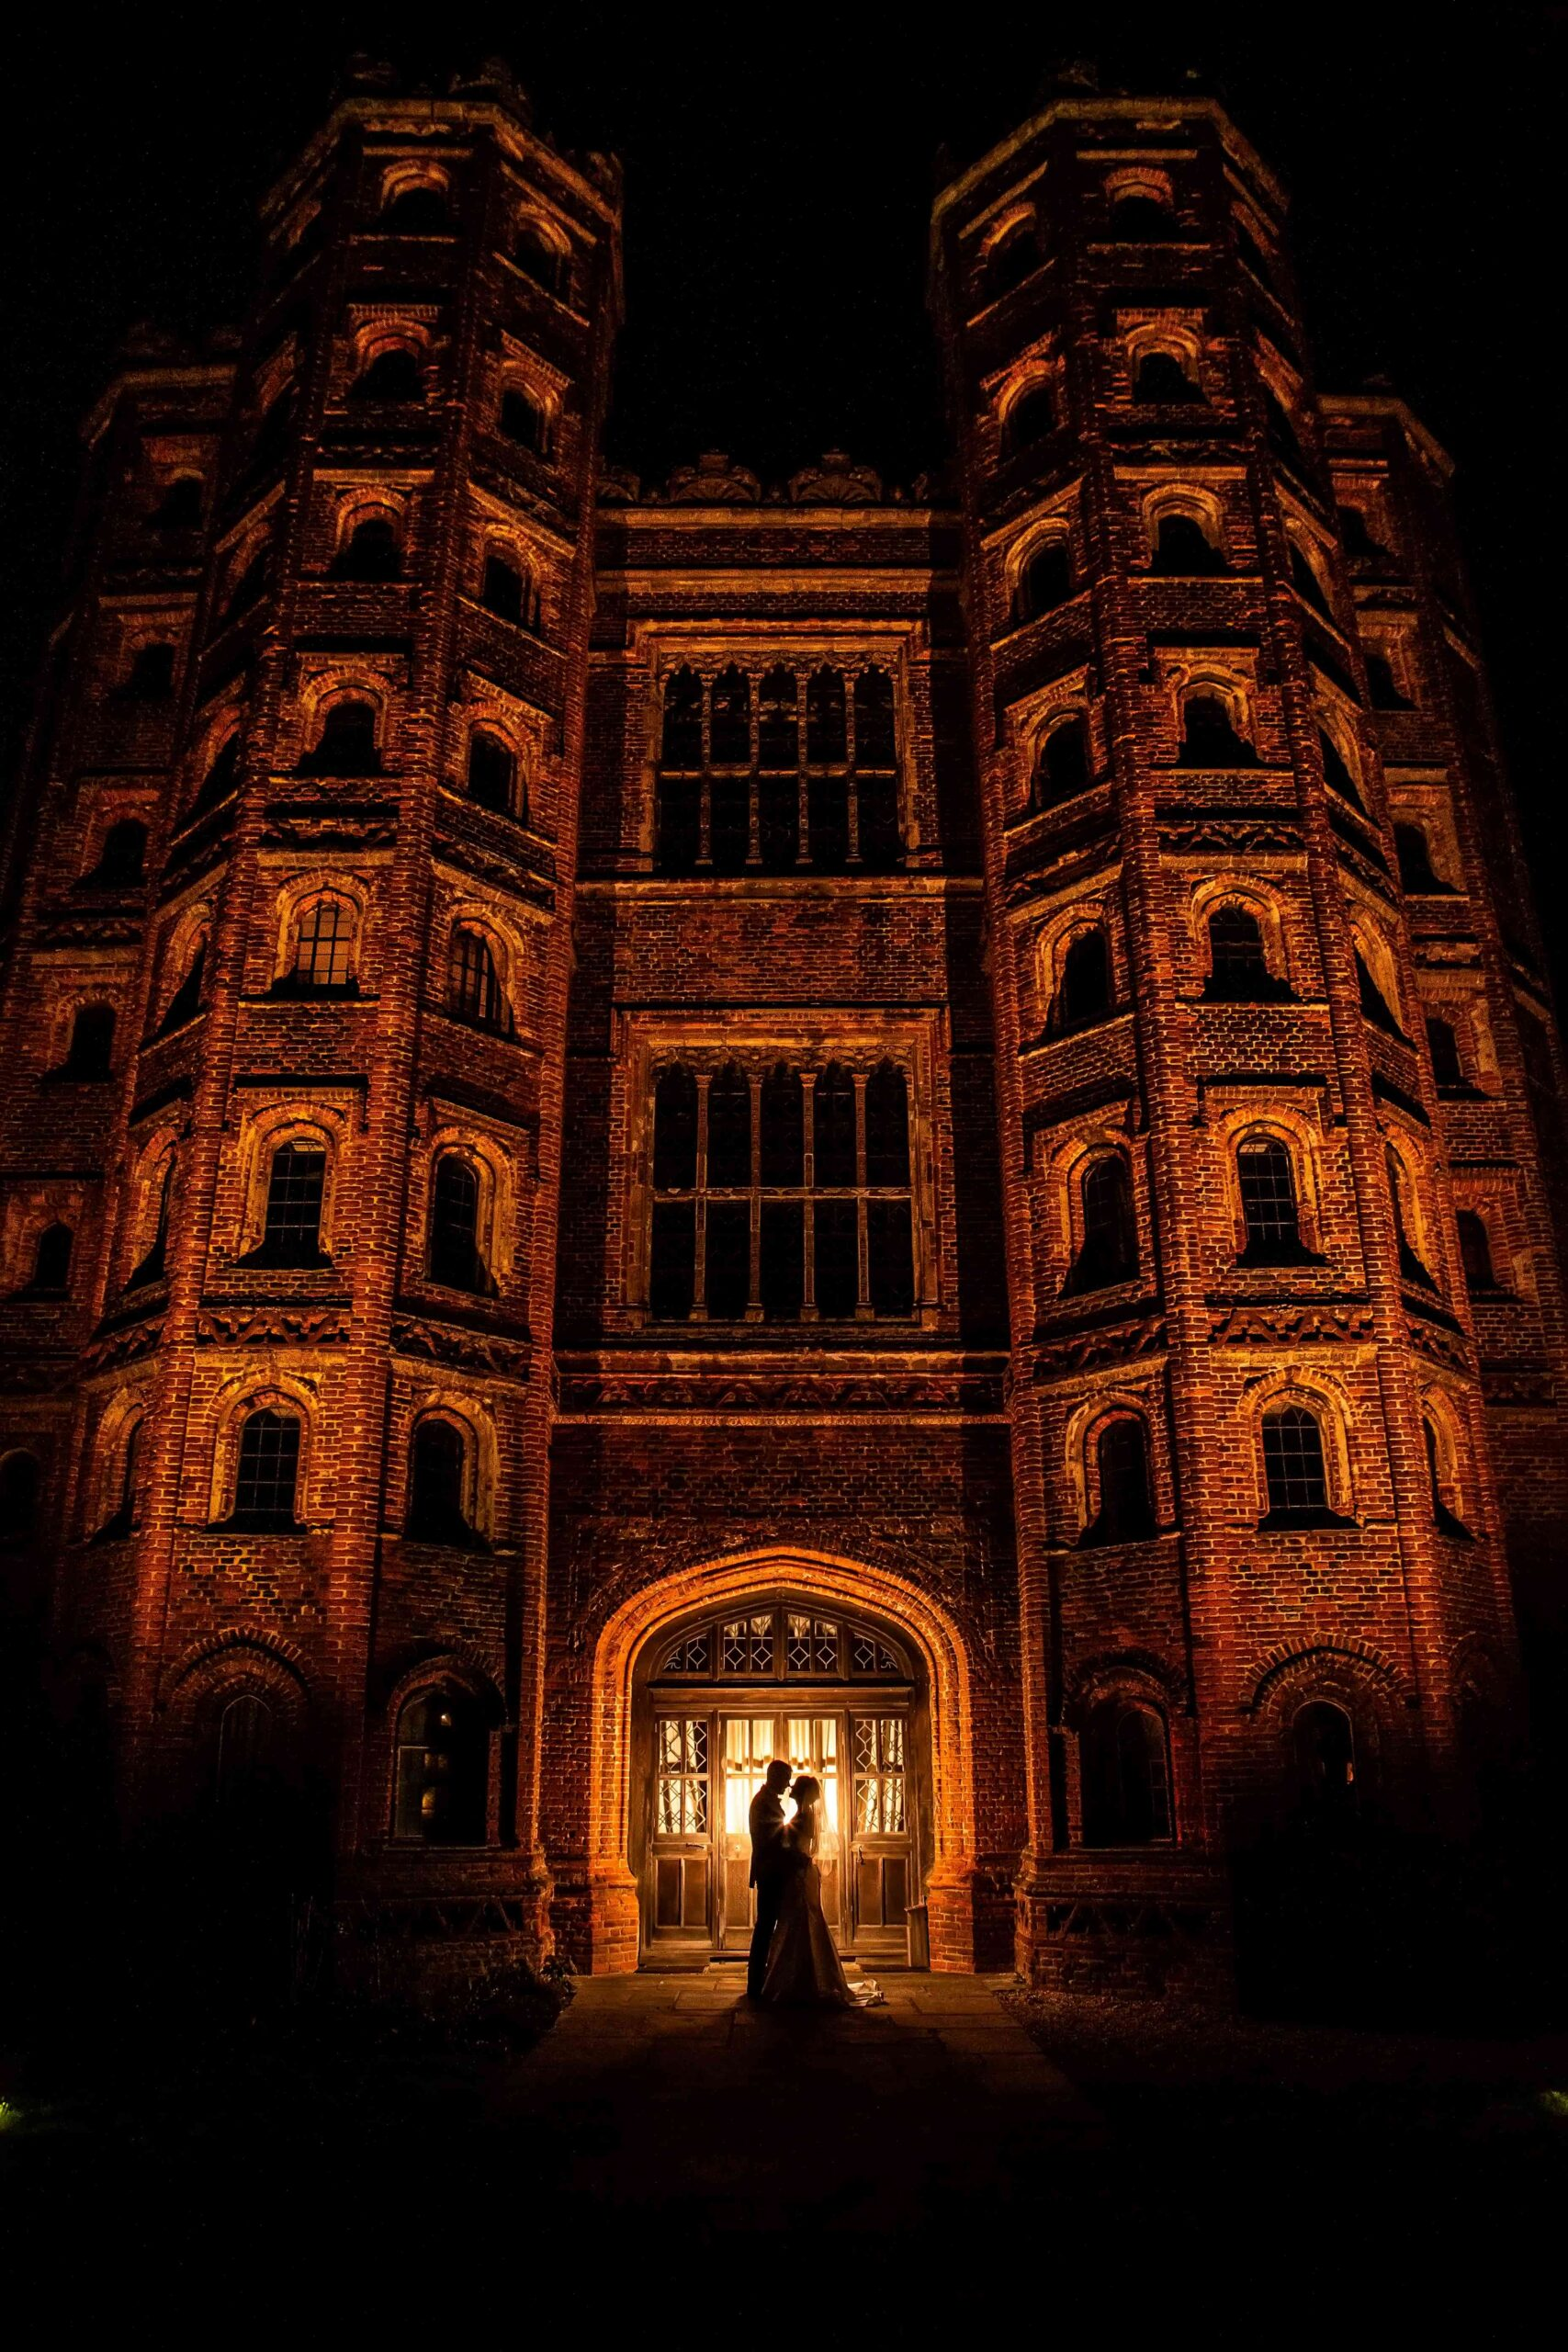 Dramatic tower at night